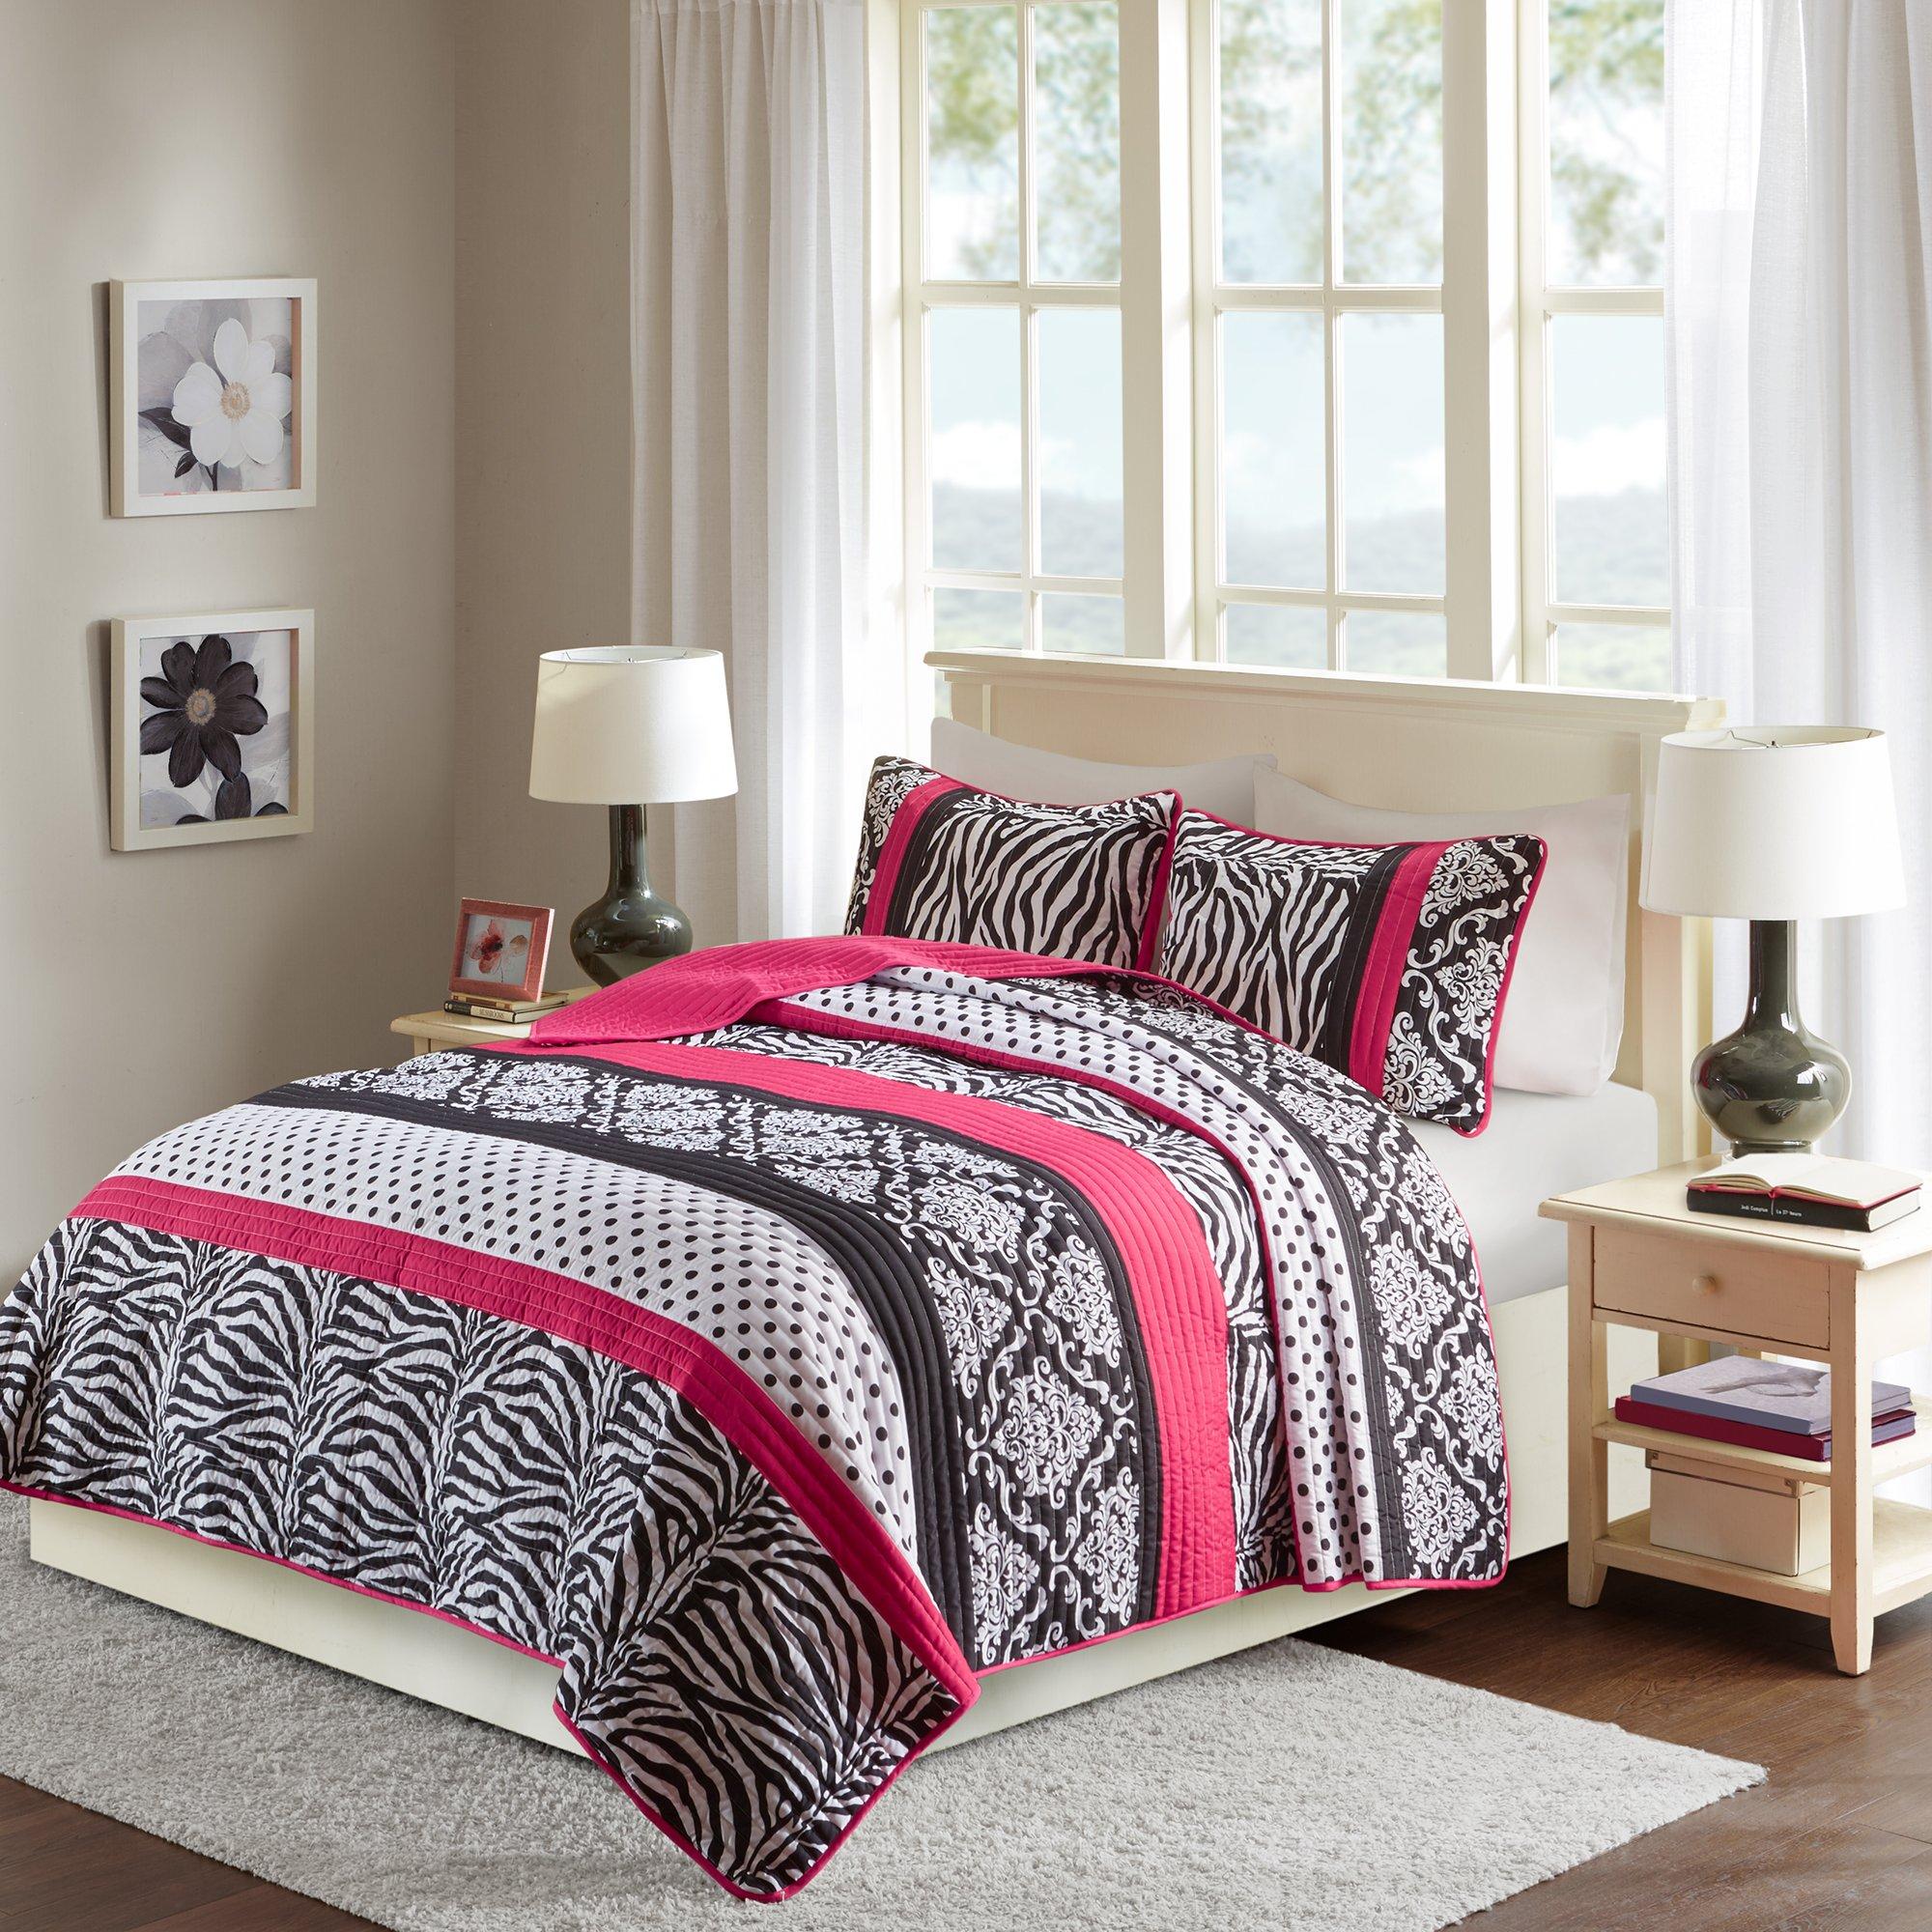 Quilt Set Full/Queen Bedding Set - Sally - Teen Girl 3 Pieces [ Hot Pink/Black Bedding ] Zebra, Damask, Polka Dot Print - Hypoallergenic Soft Microfiber All Season Twin Coverlet